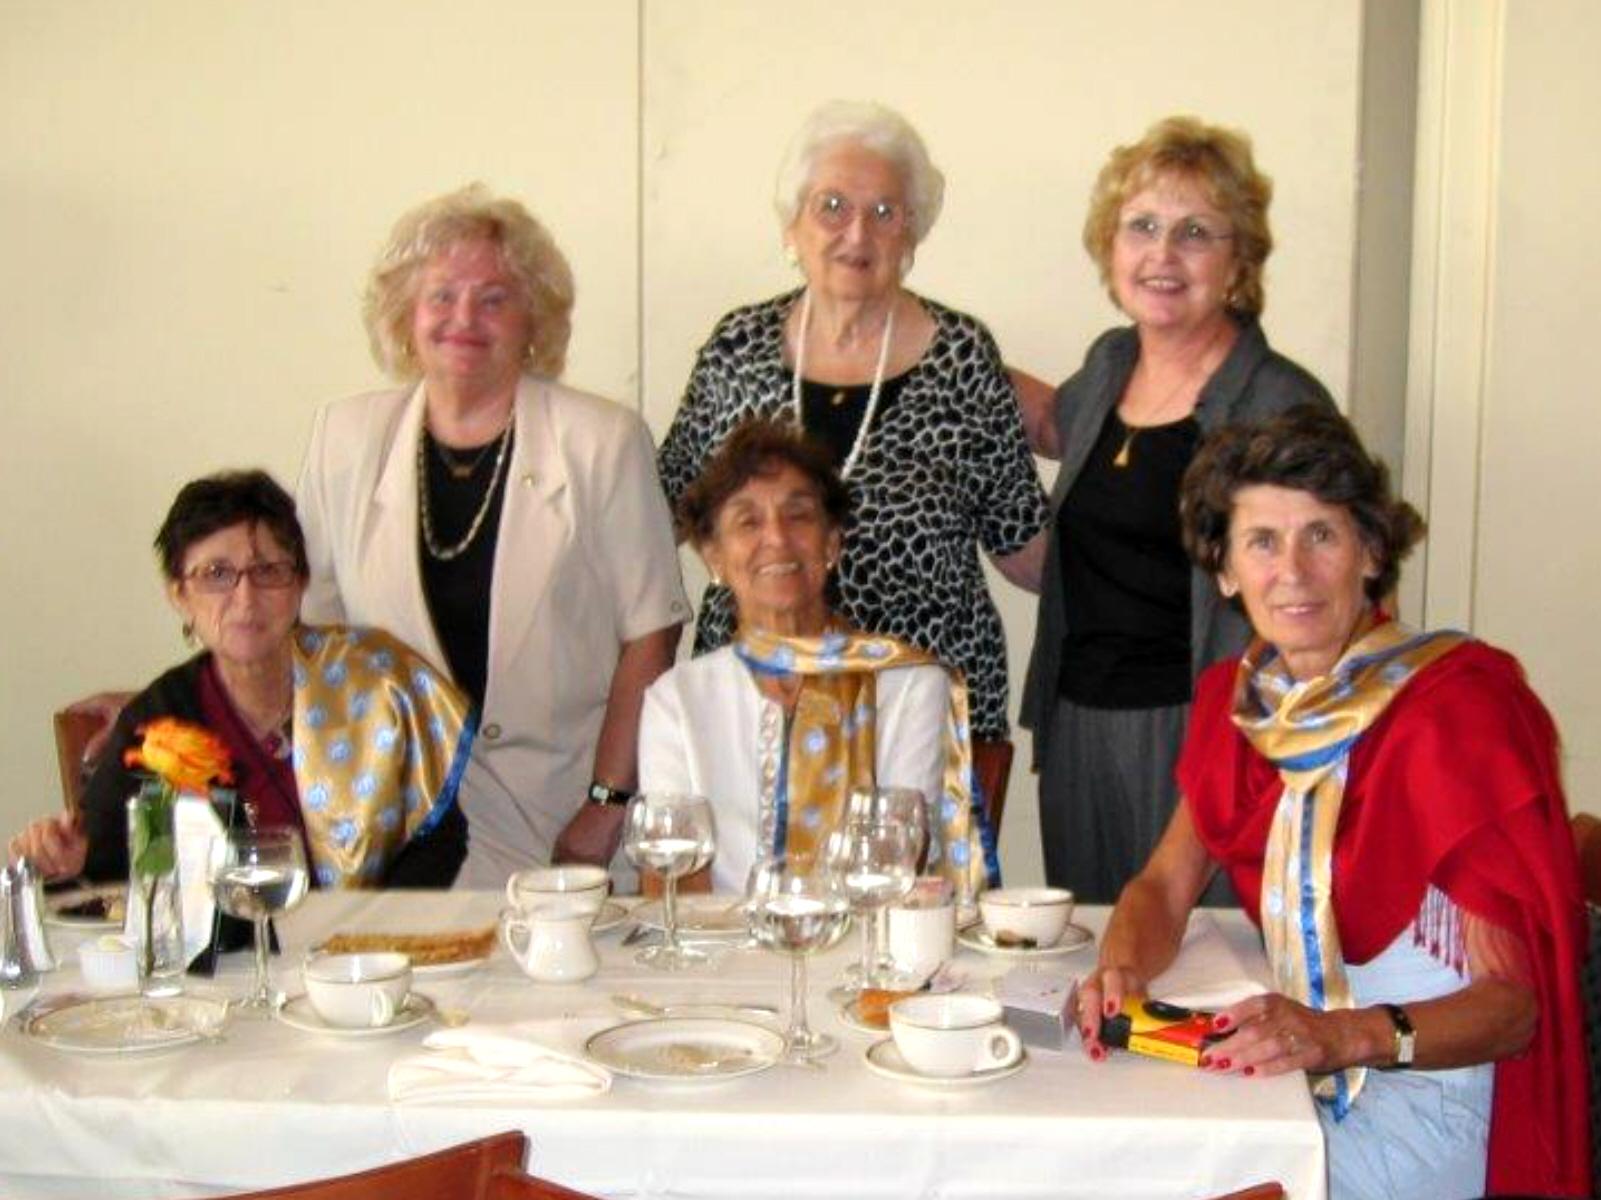 Luncheon UN August 2005 Dee Carroll, Leonia Sagasta, Dot McNamara  Greta Hvaring